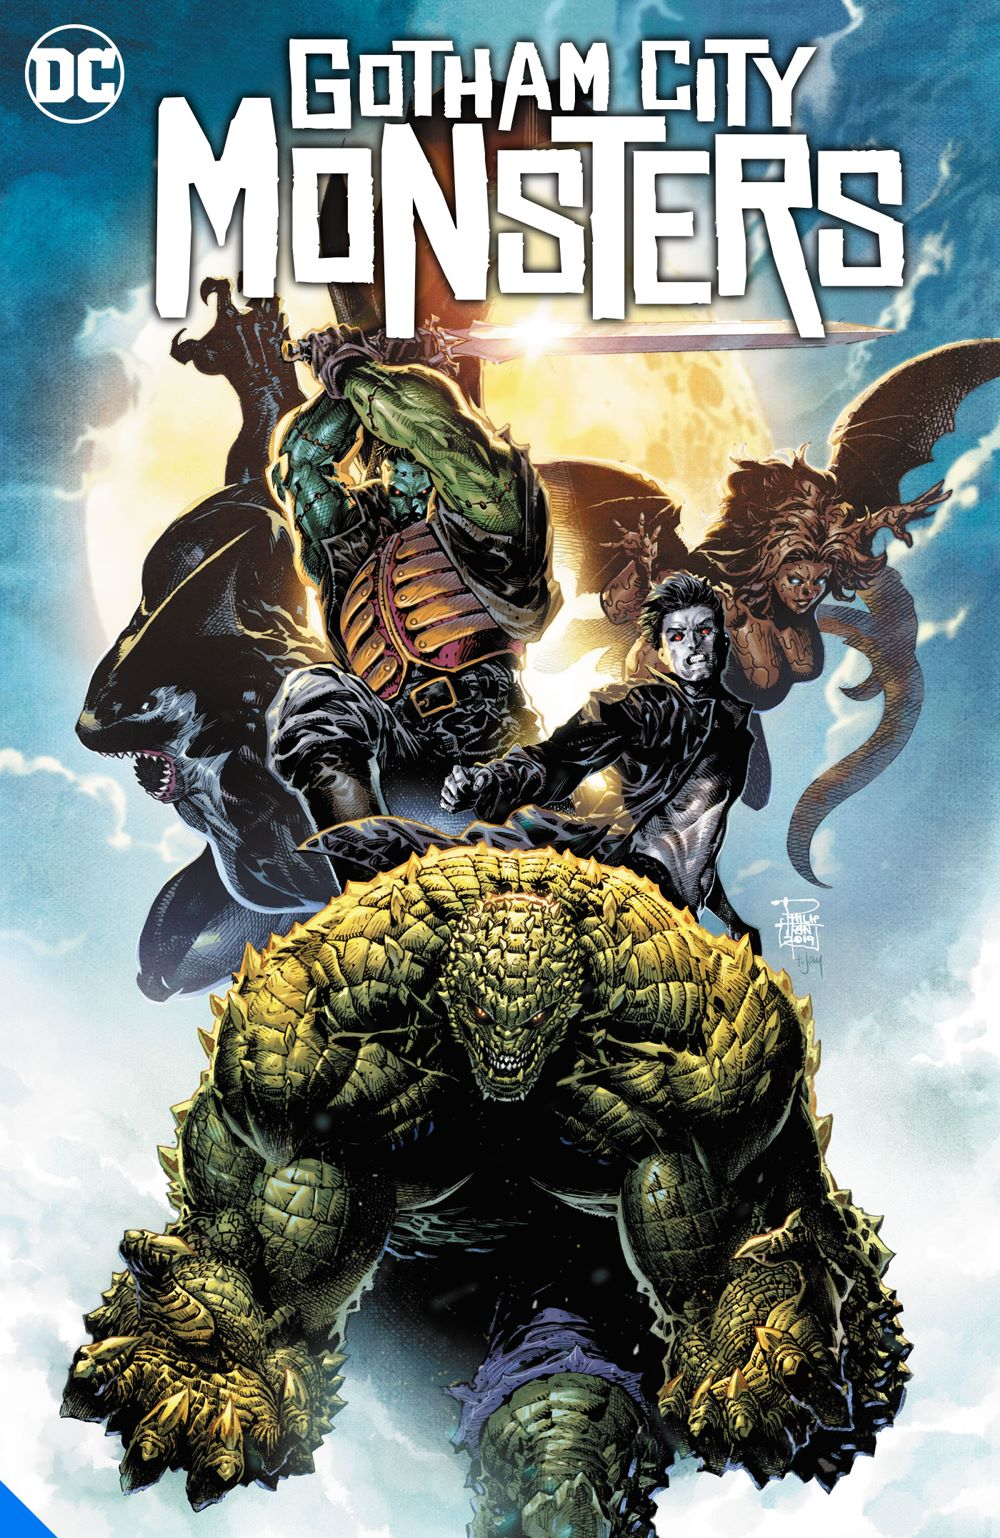 gothamcitymonsters_adv DC Comics July 2021 Solicitations